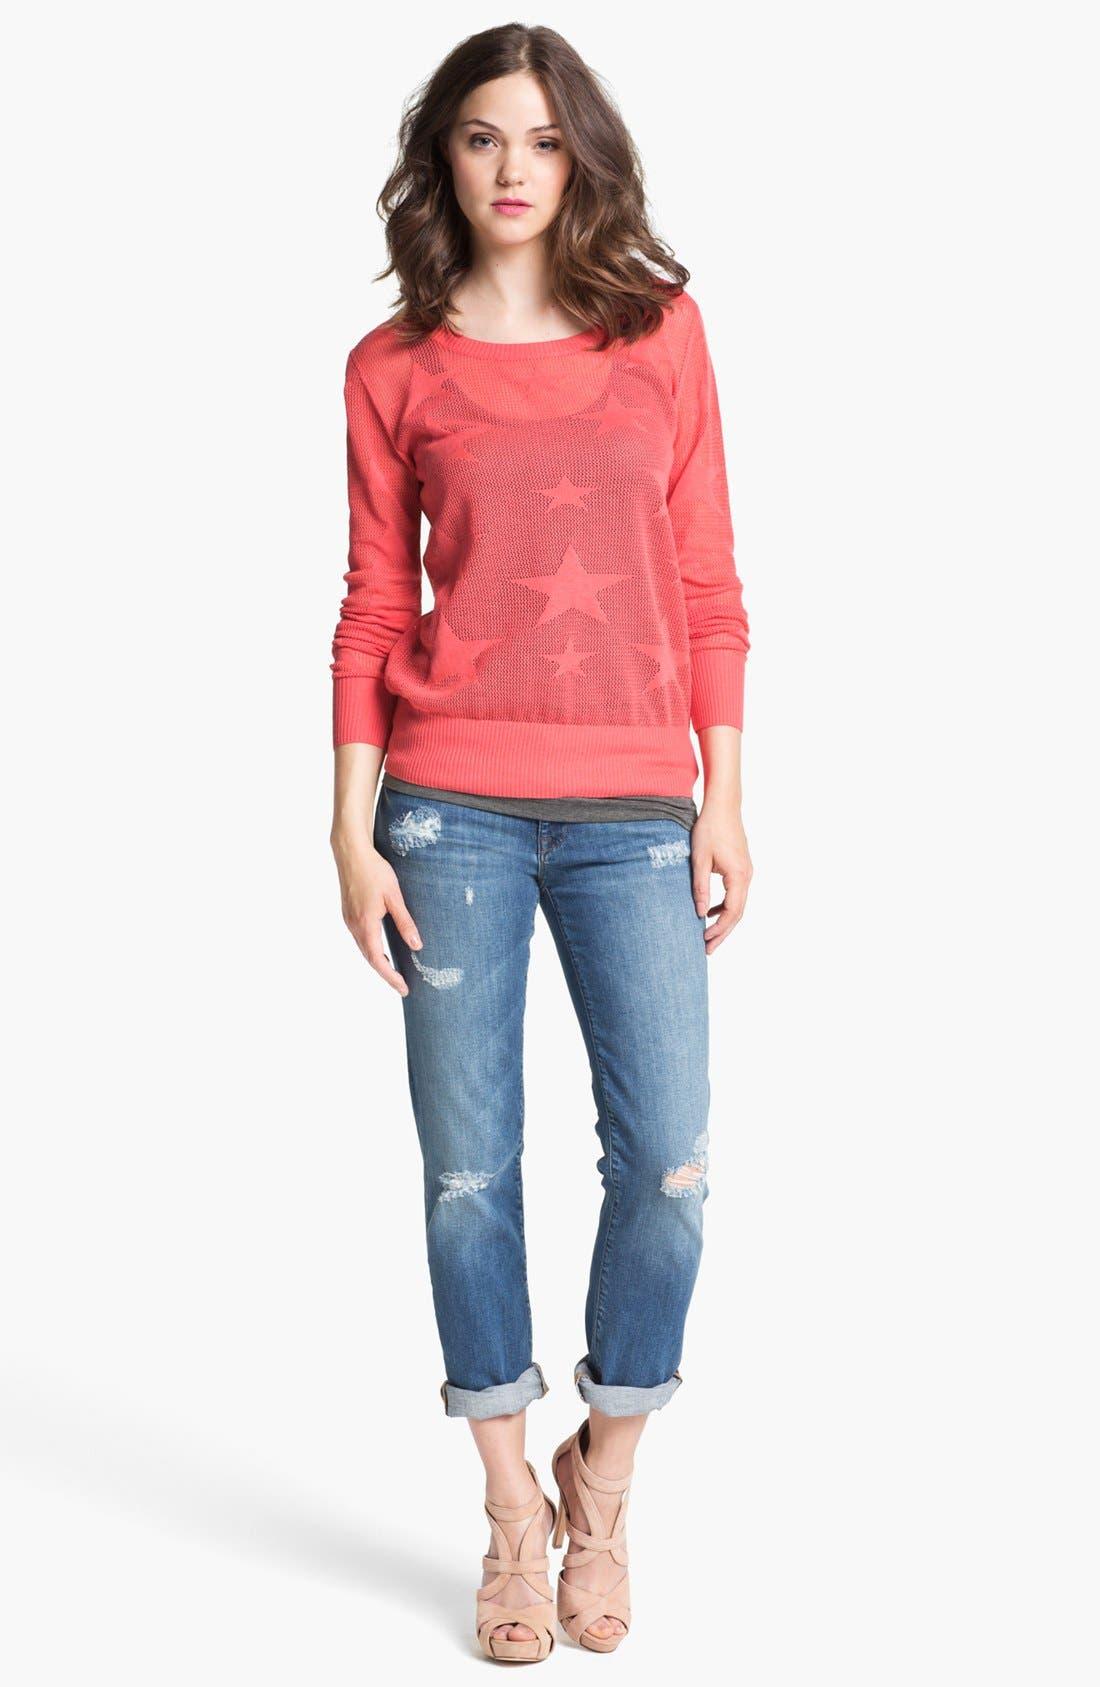 Main Image - Mavi Jeans 'Emma' Slim Boyfriend Jeans (Nolita Blue) (Online Only)